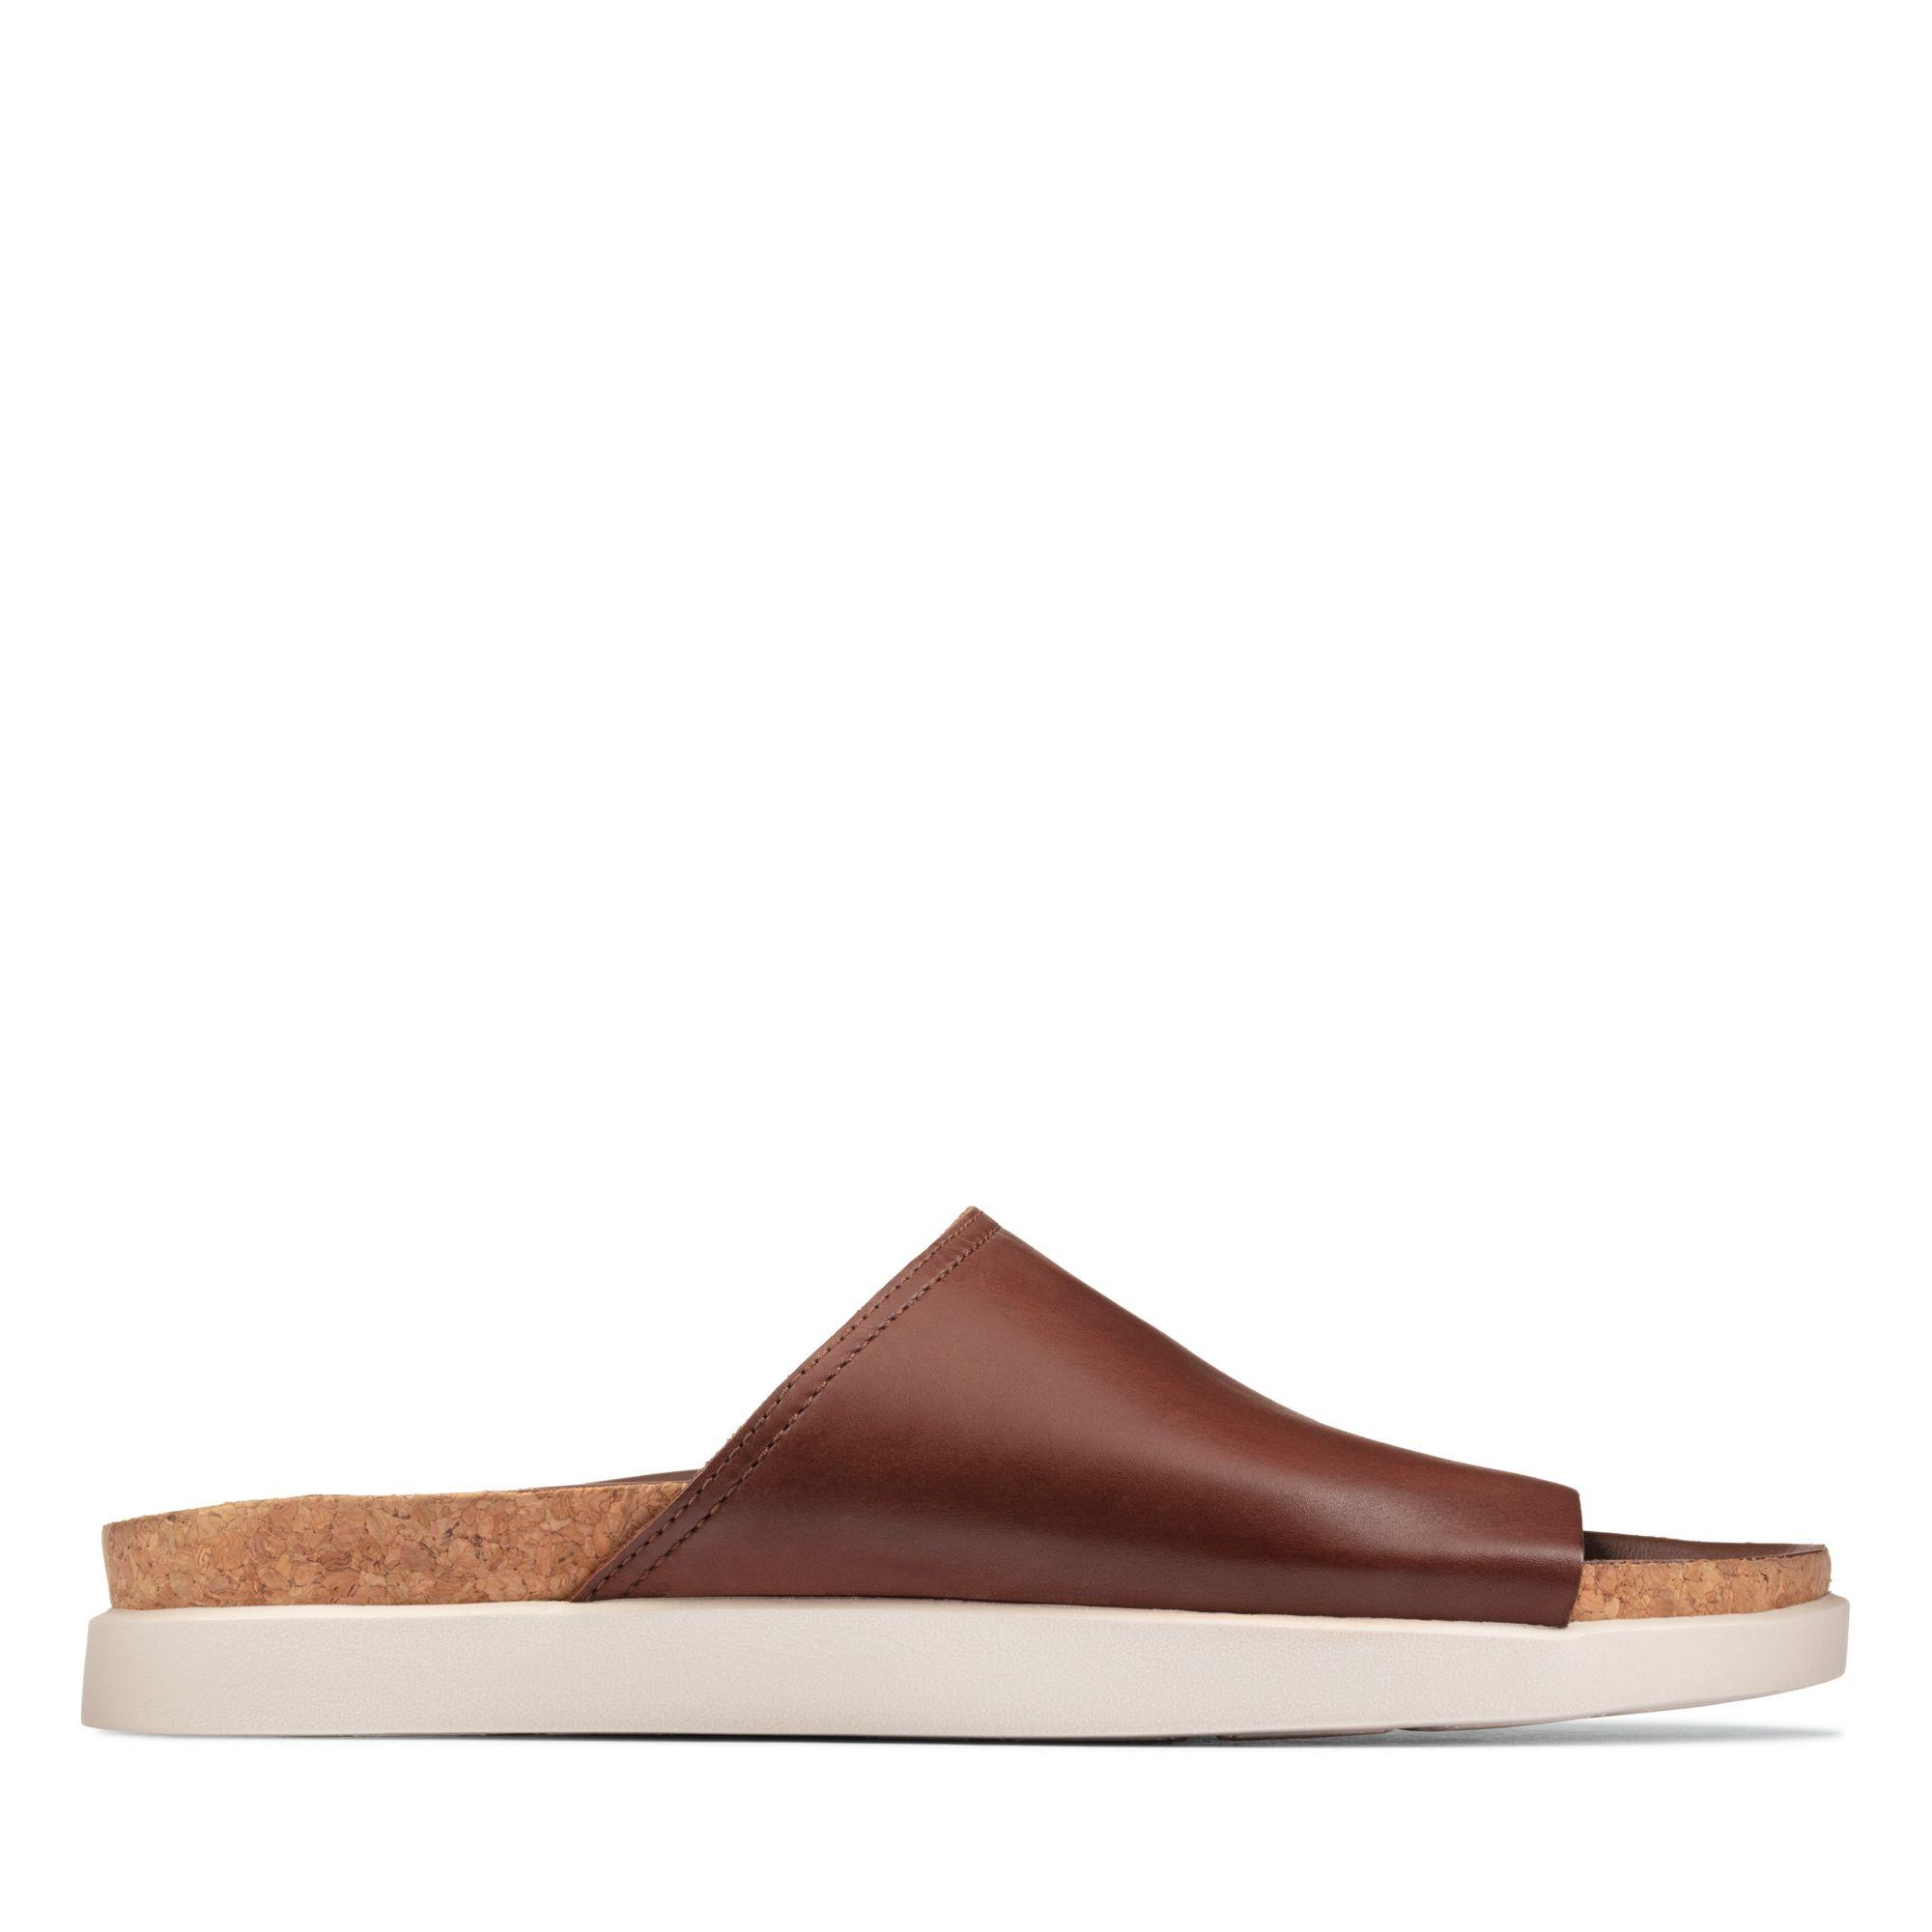 Clarks Sunder Slide – Leather